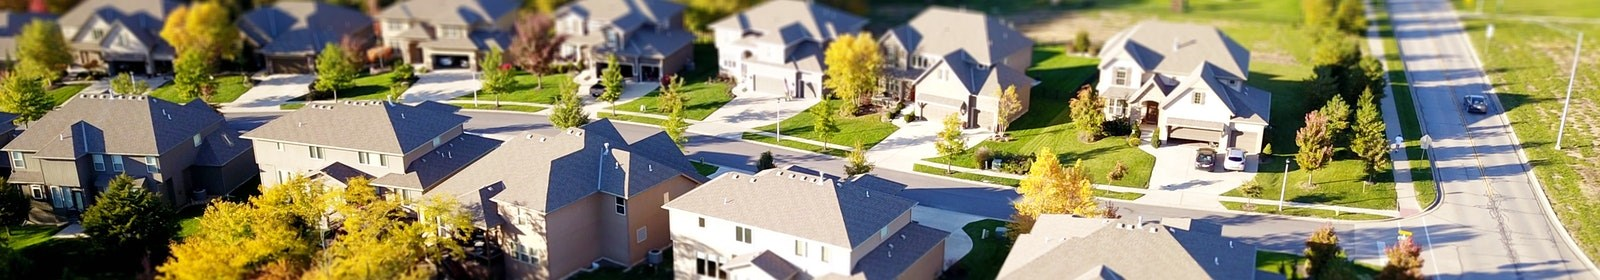 A suburb by choice needs careful consideration